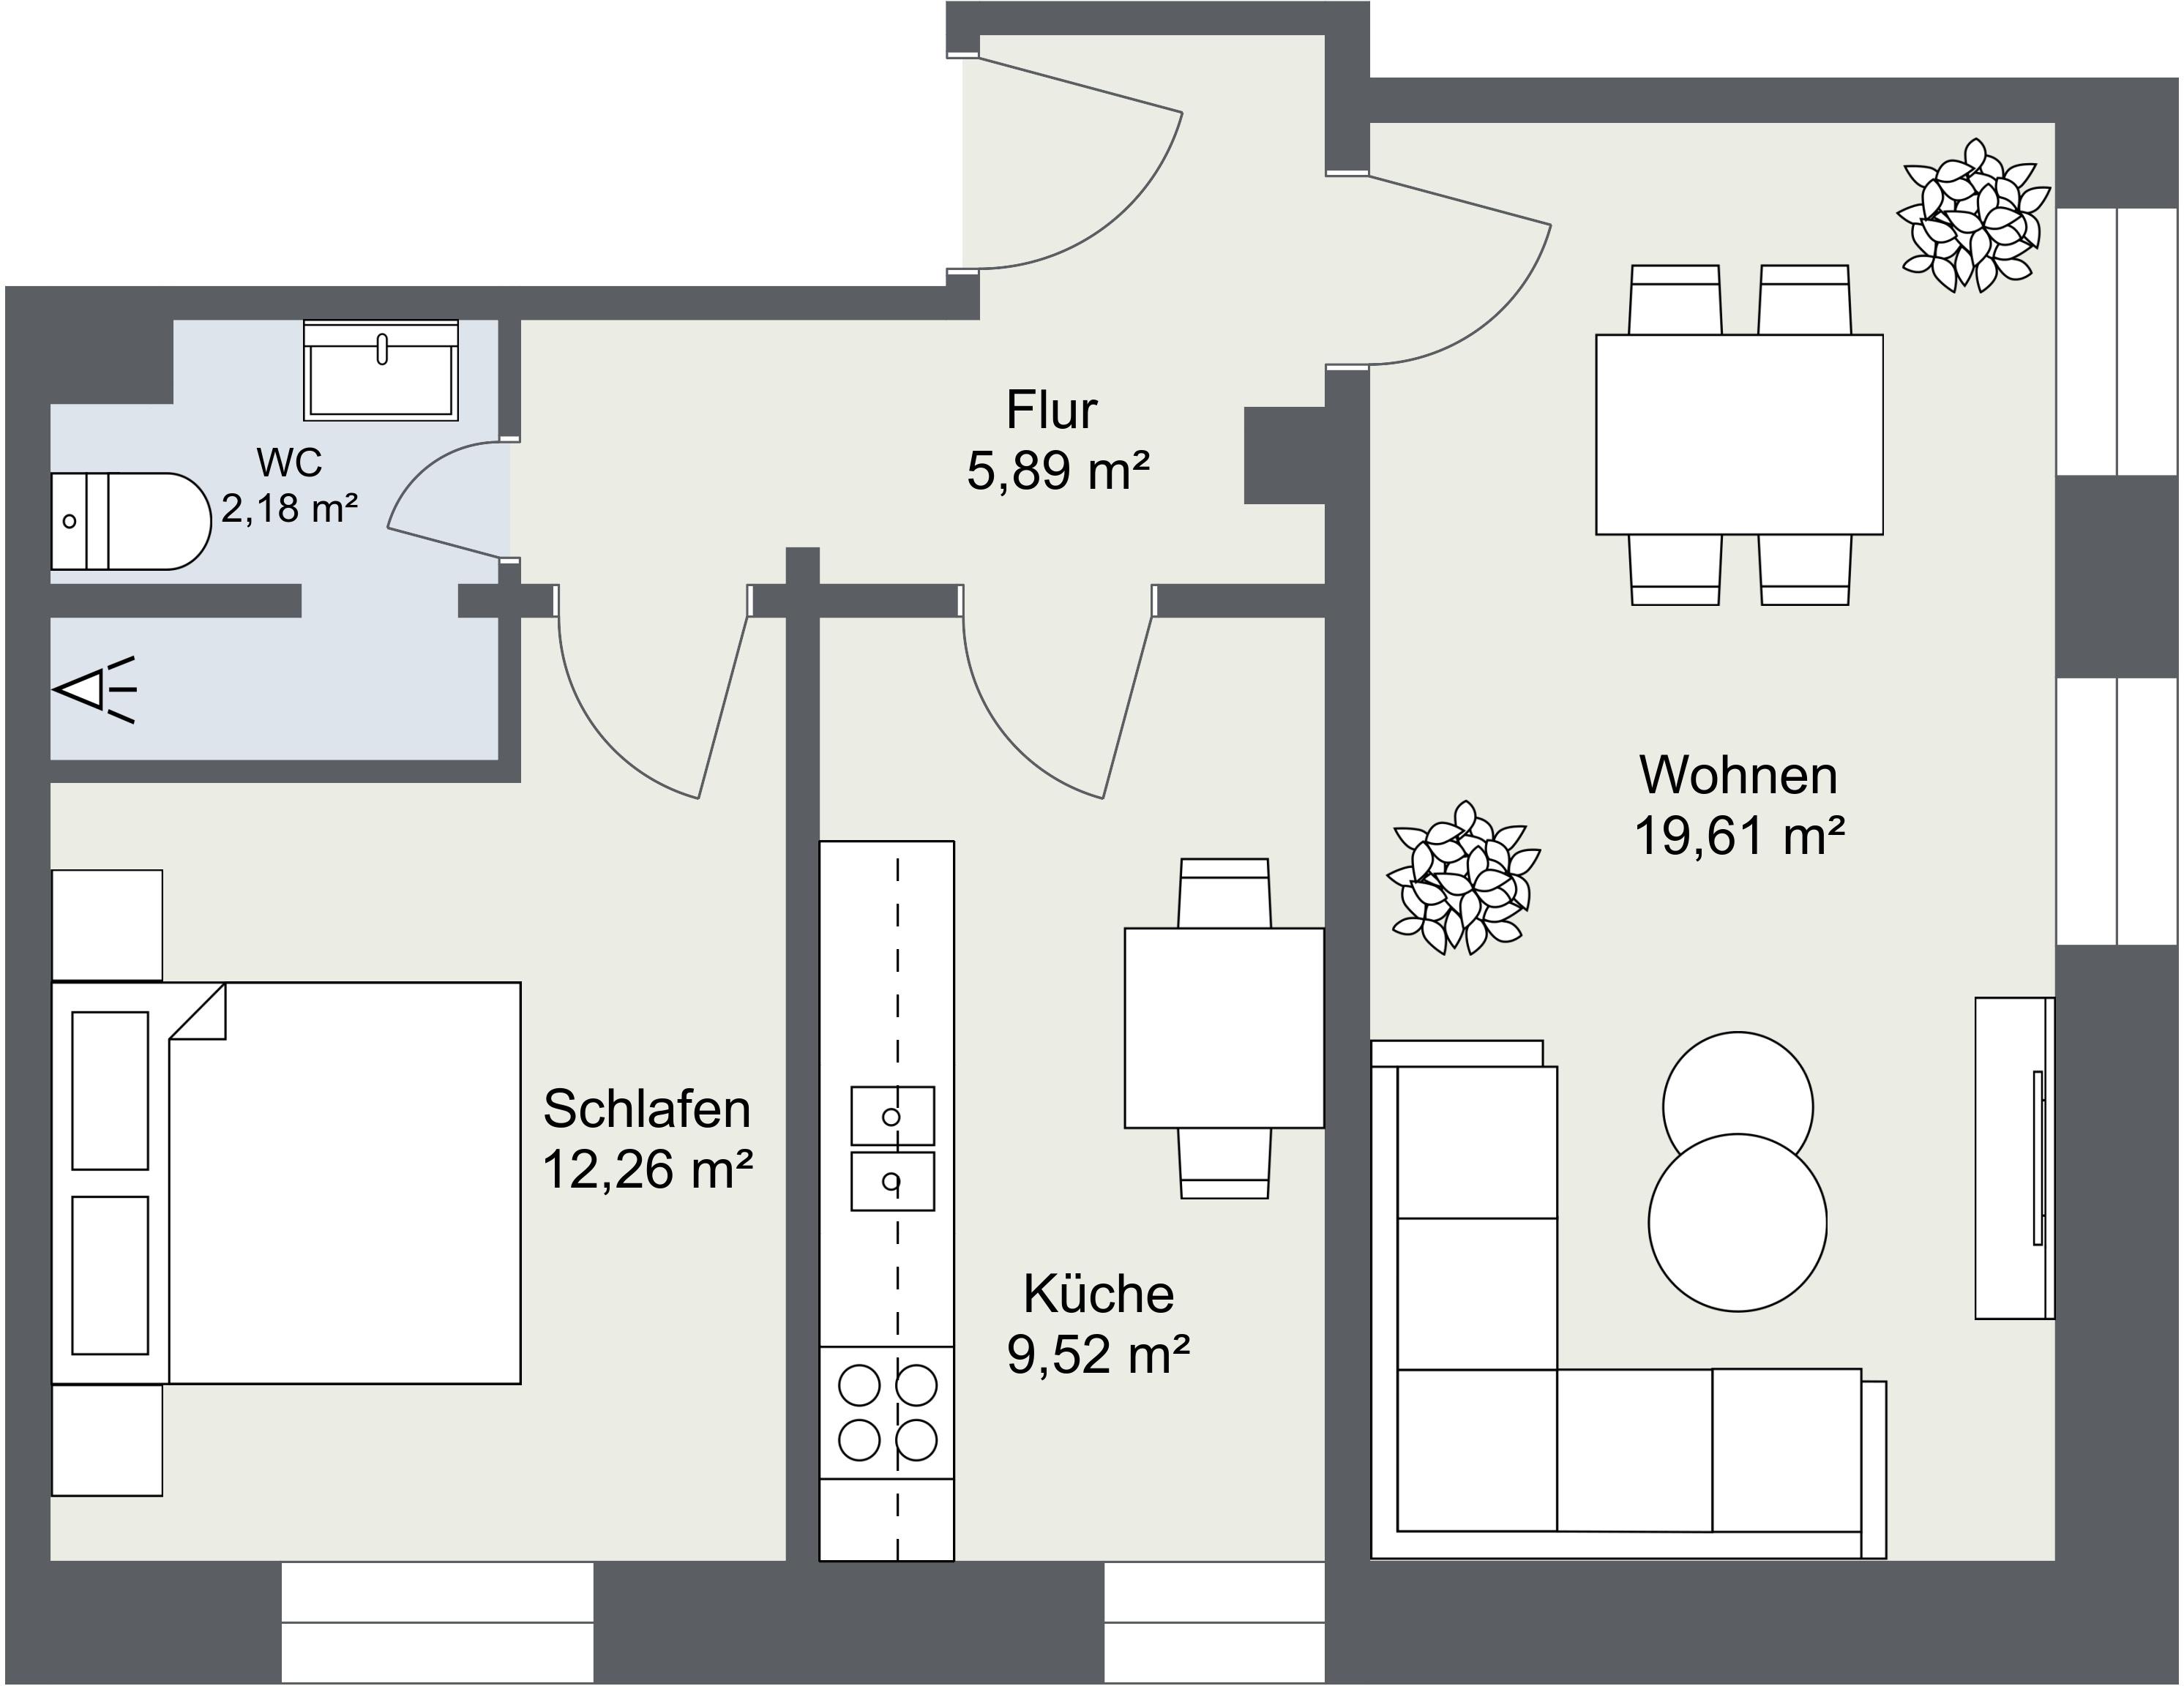 Grundriss Fewo 2 Moselhaus Uferallee Bernkastel-Kues (Wehlen)